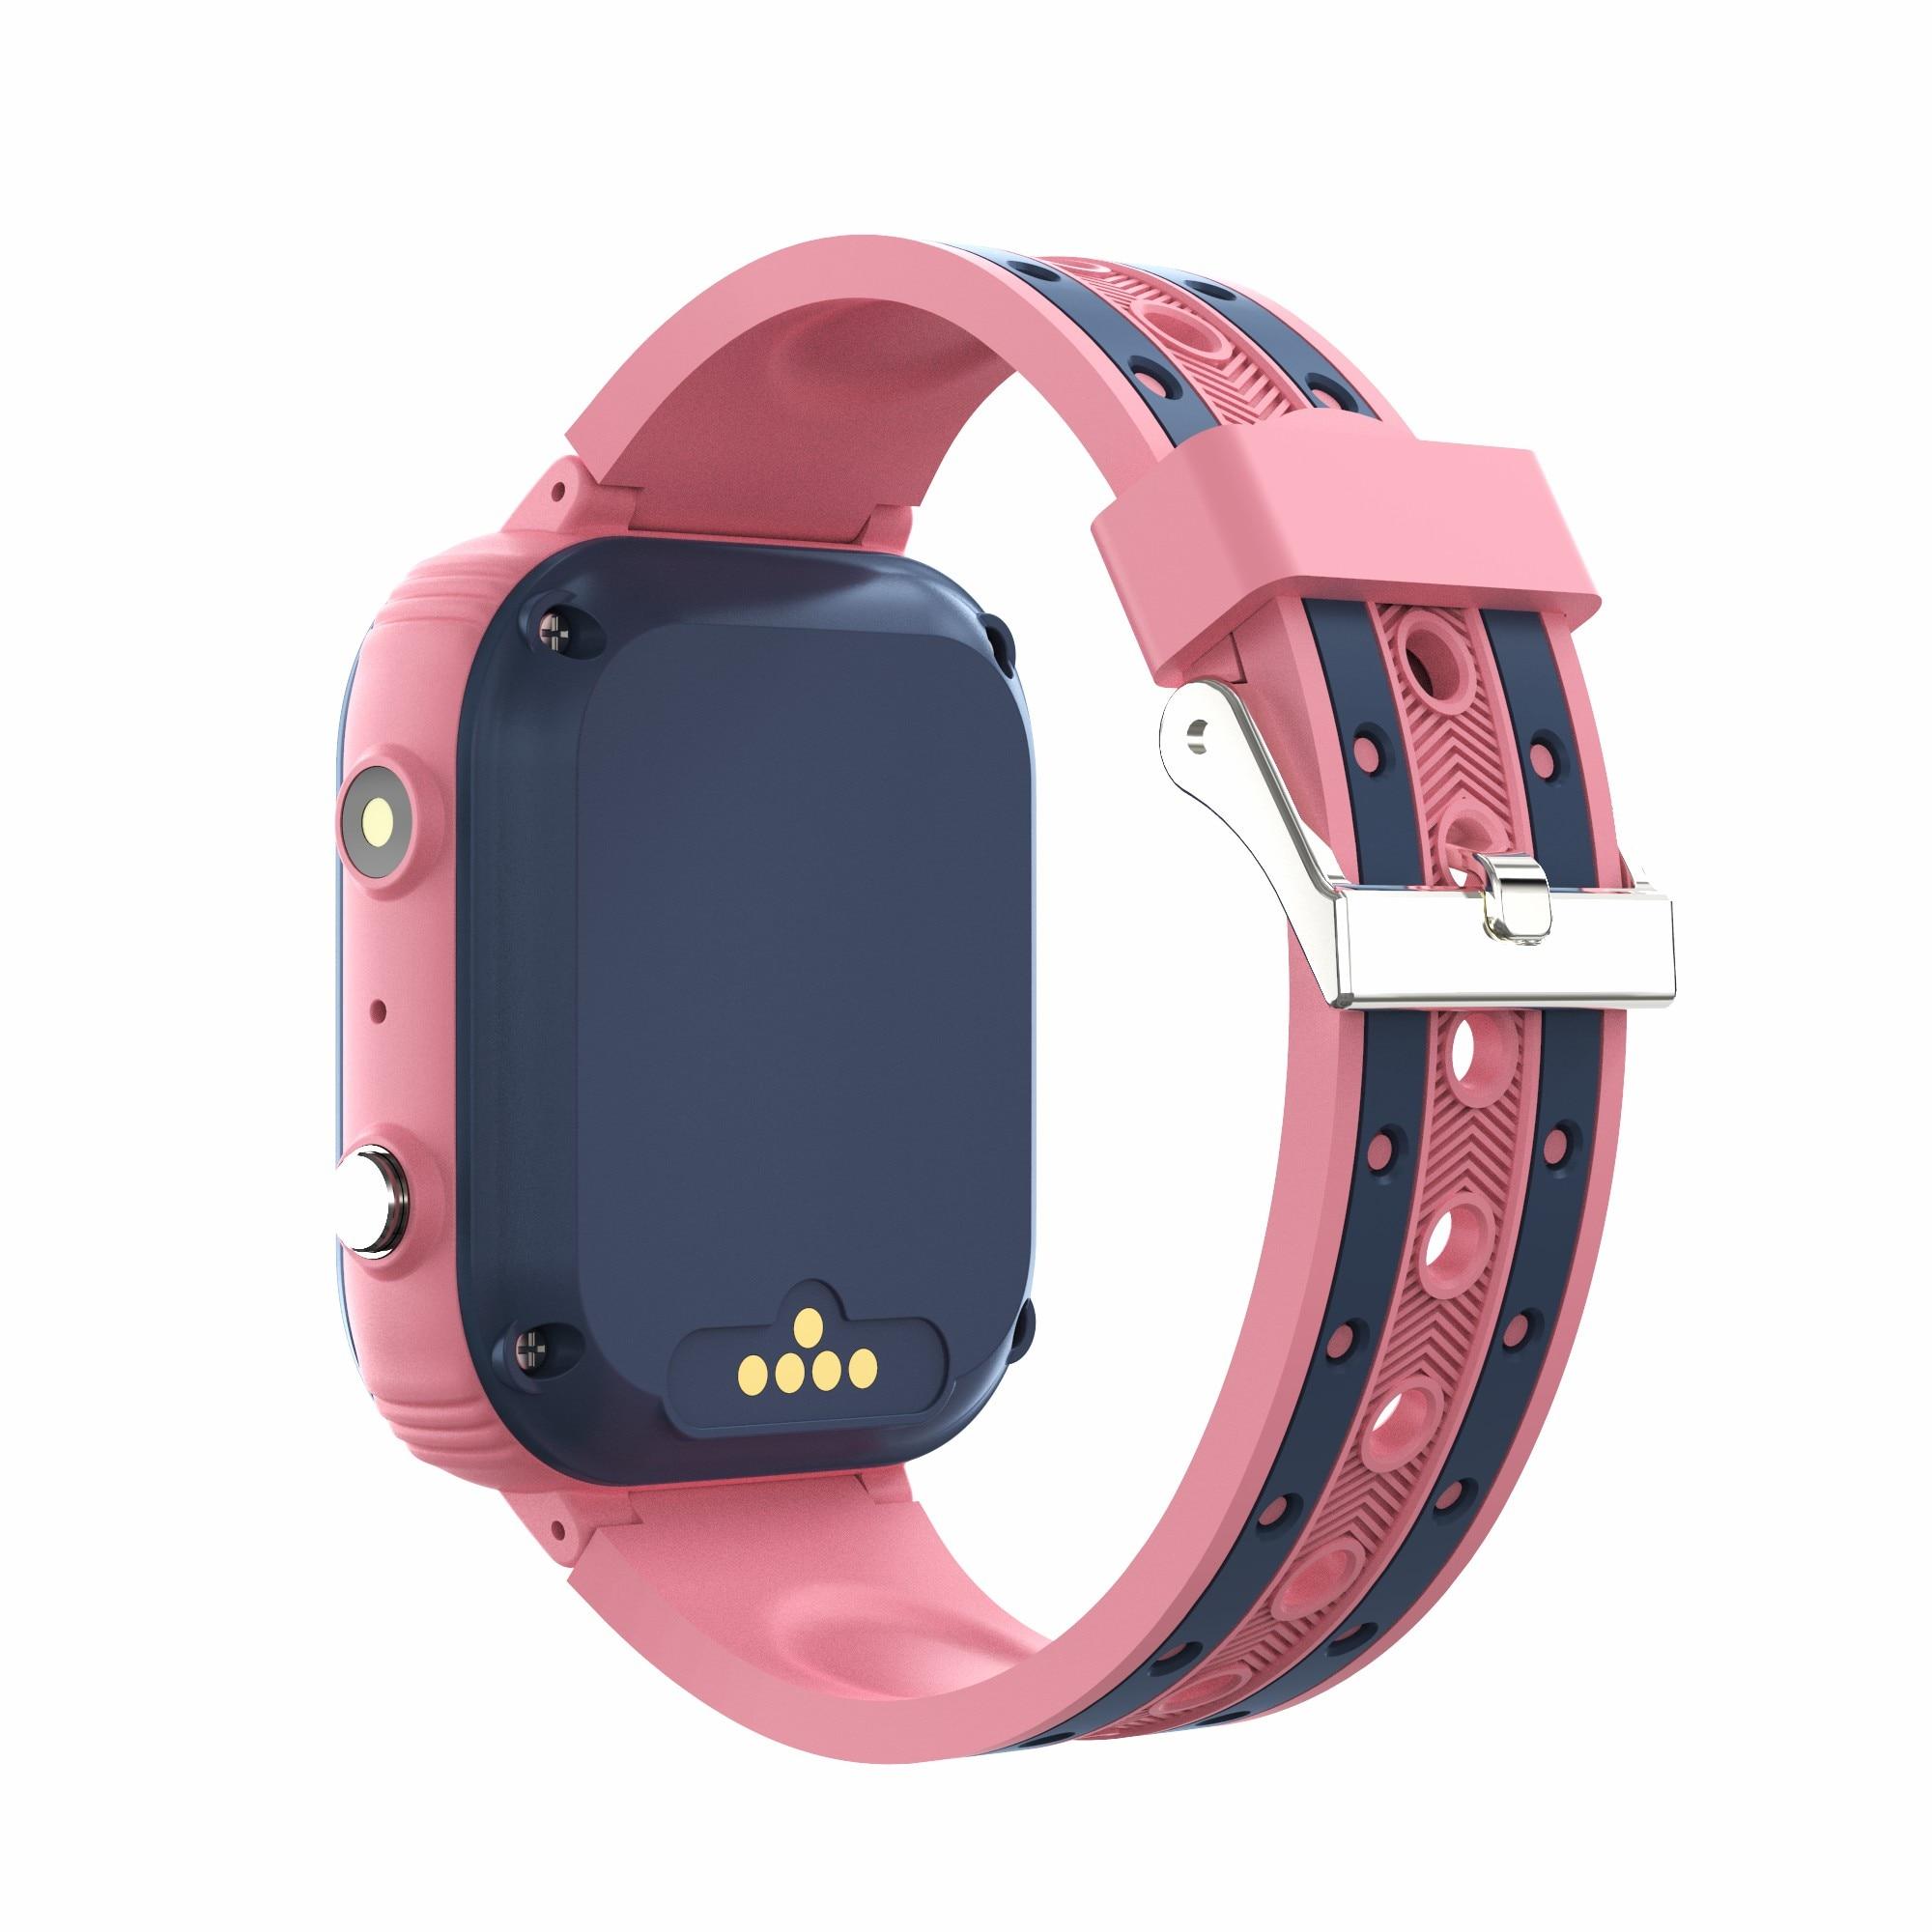 H1ca837437d554738a09c873346a94f6bd LT21 4G Smart Watch Kids GPS WIFI Video Call SOS IP67 Waterproof Child Smartwatch Camera Monitor Tracker Location Phone Watch